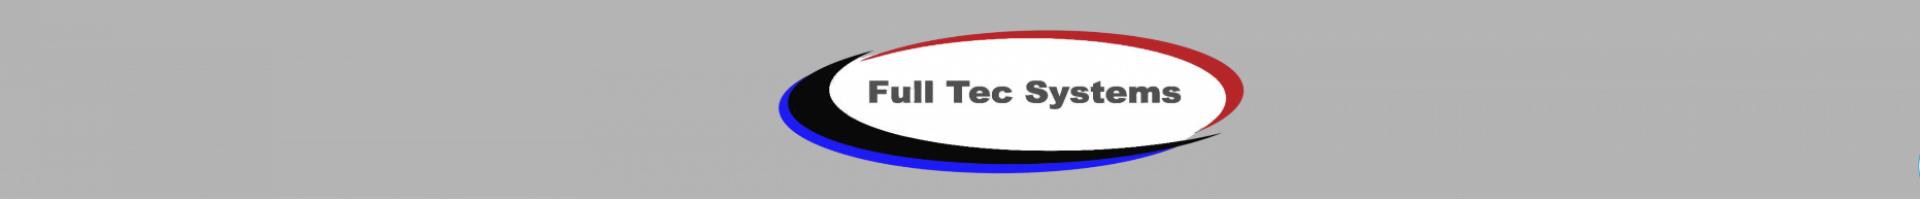 Full Tec Systems